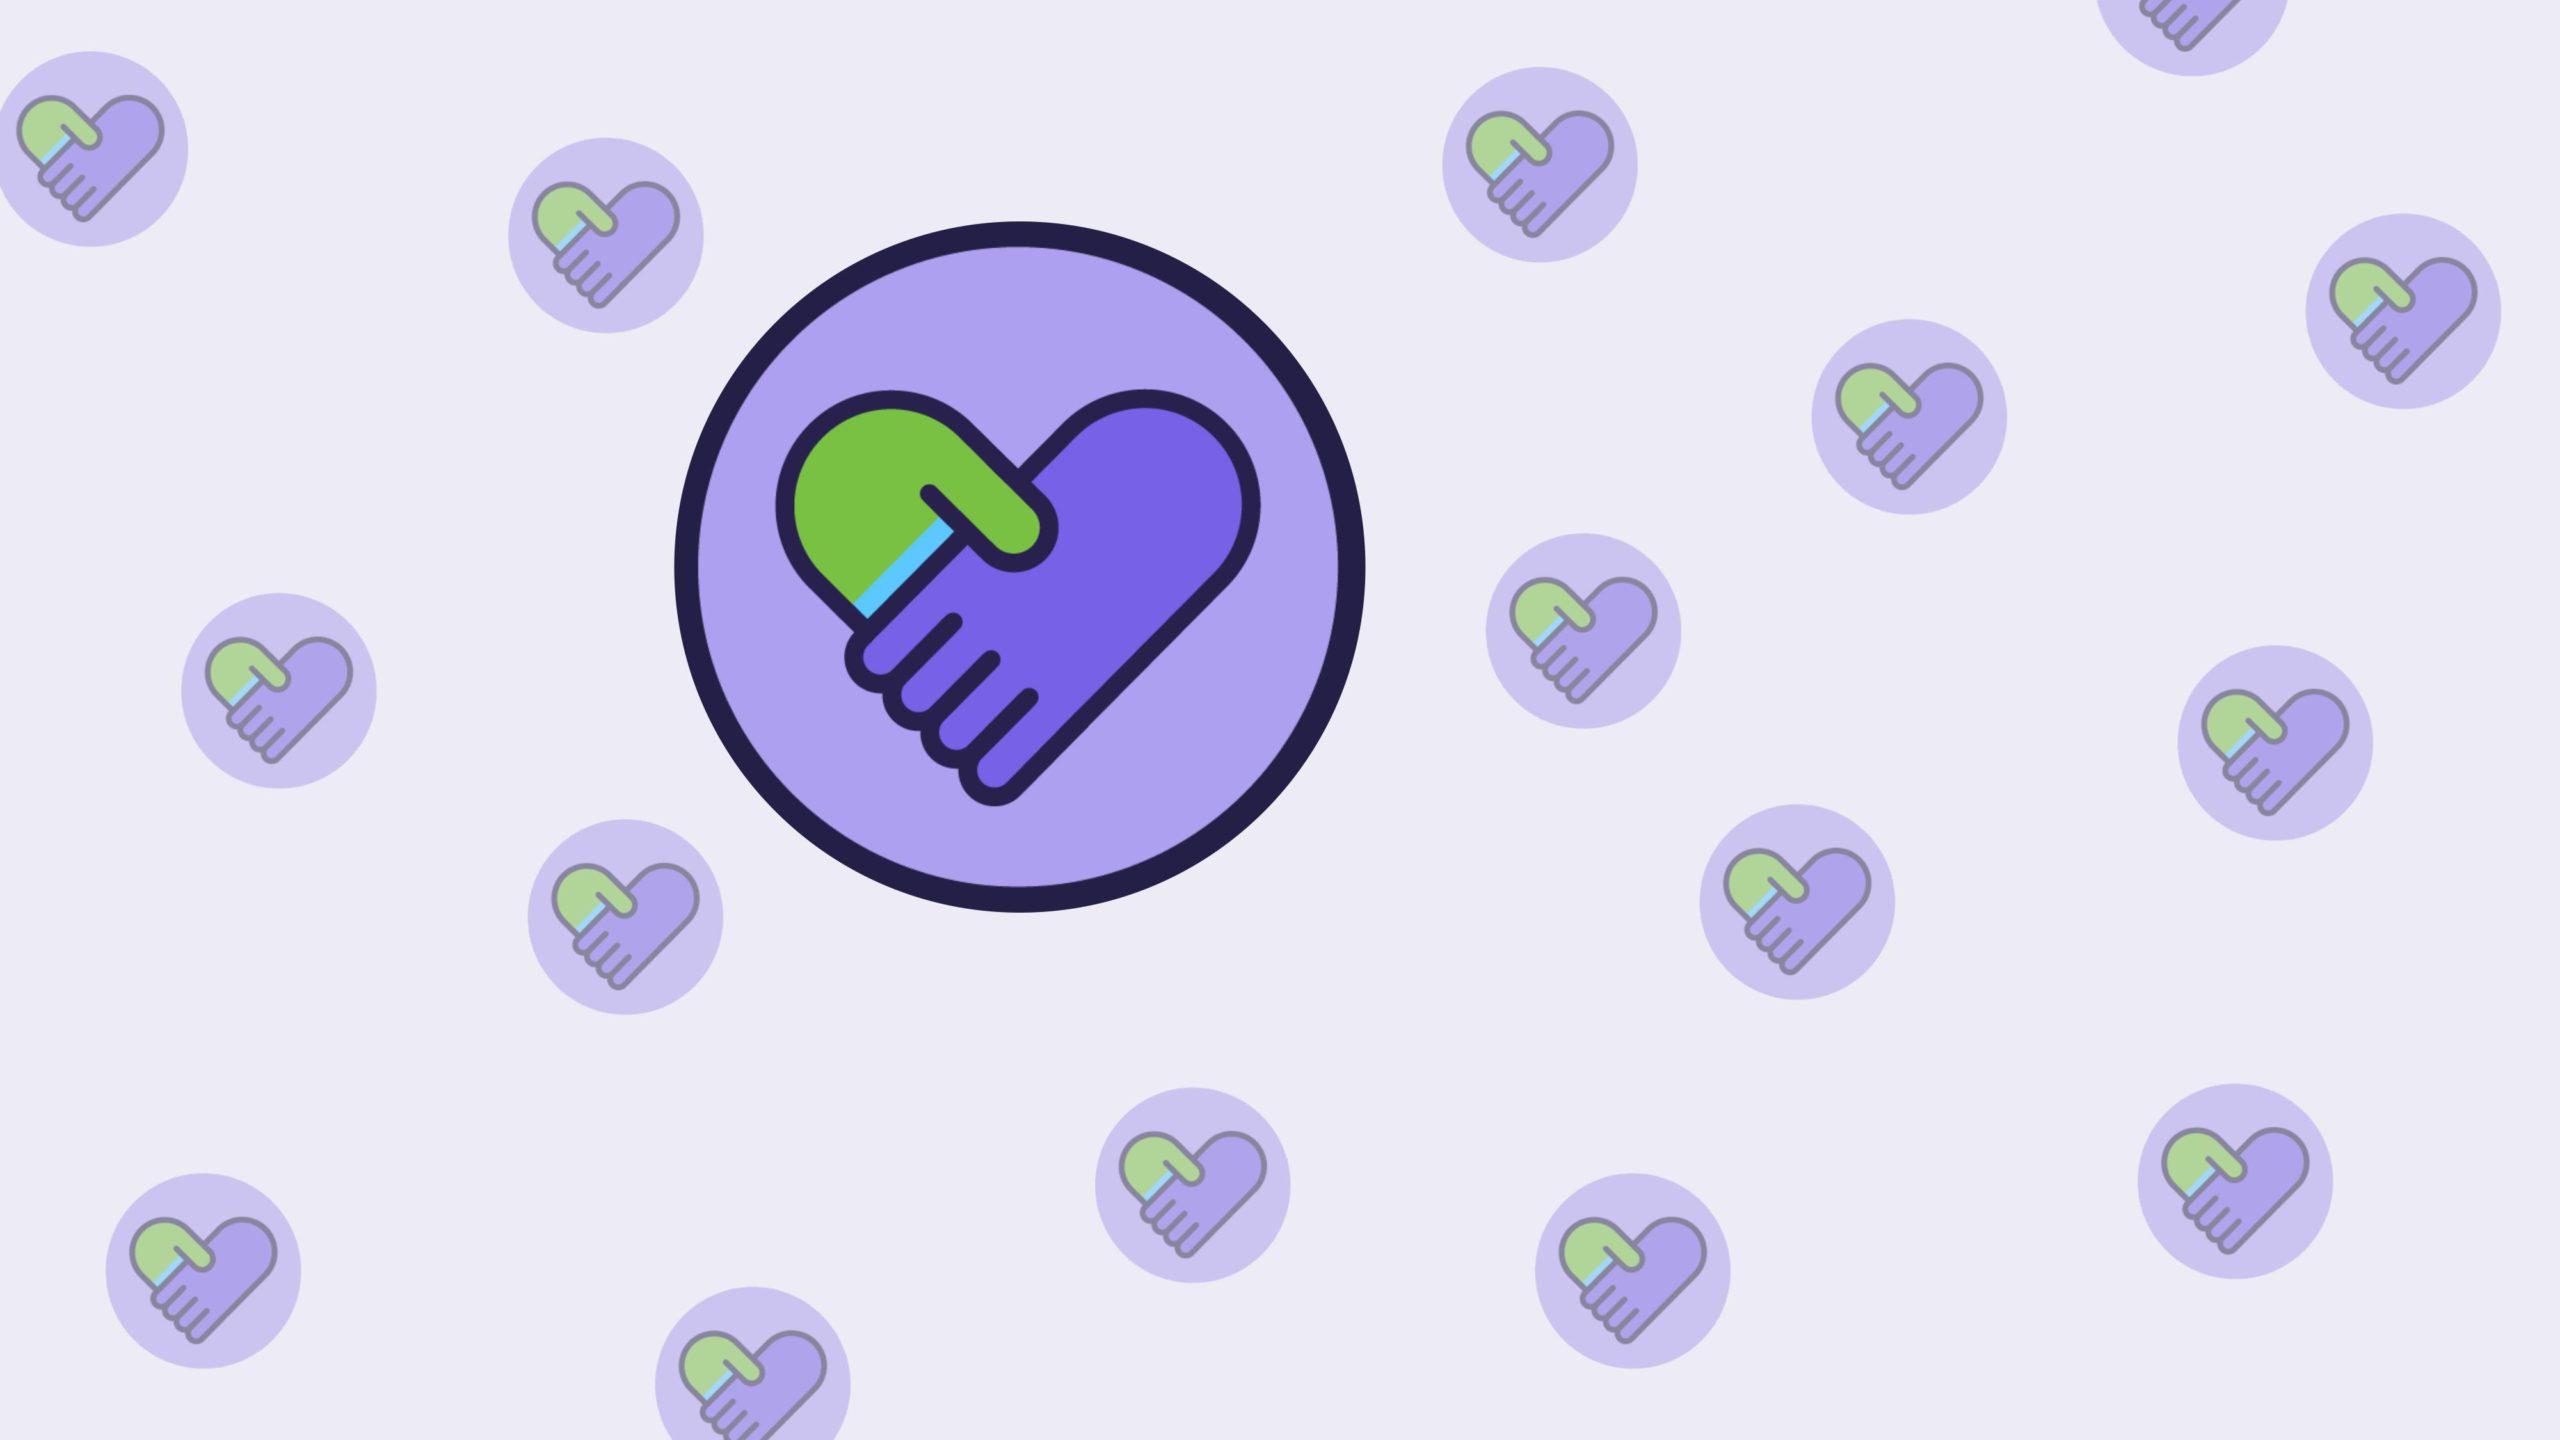 The social motivator icon.